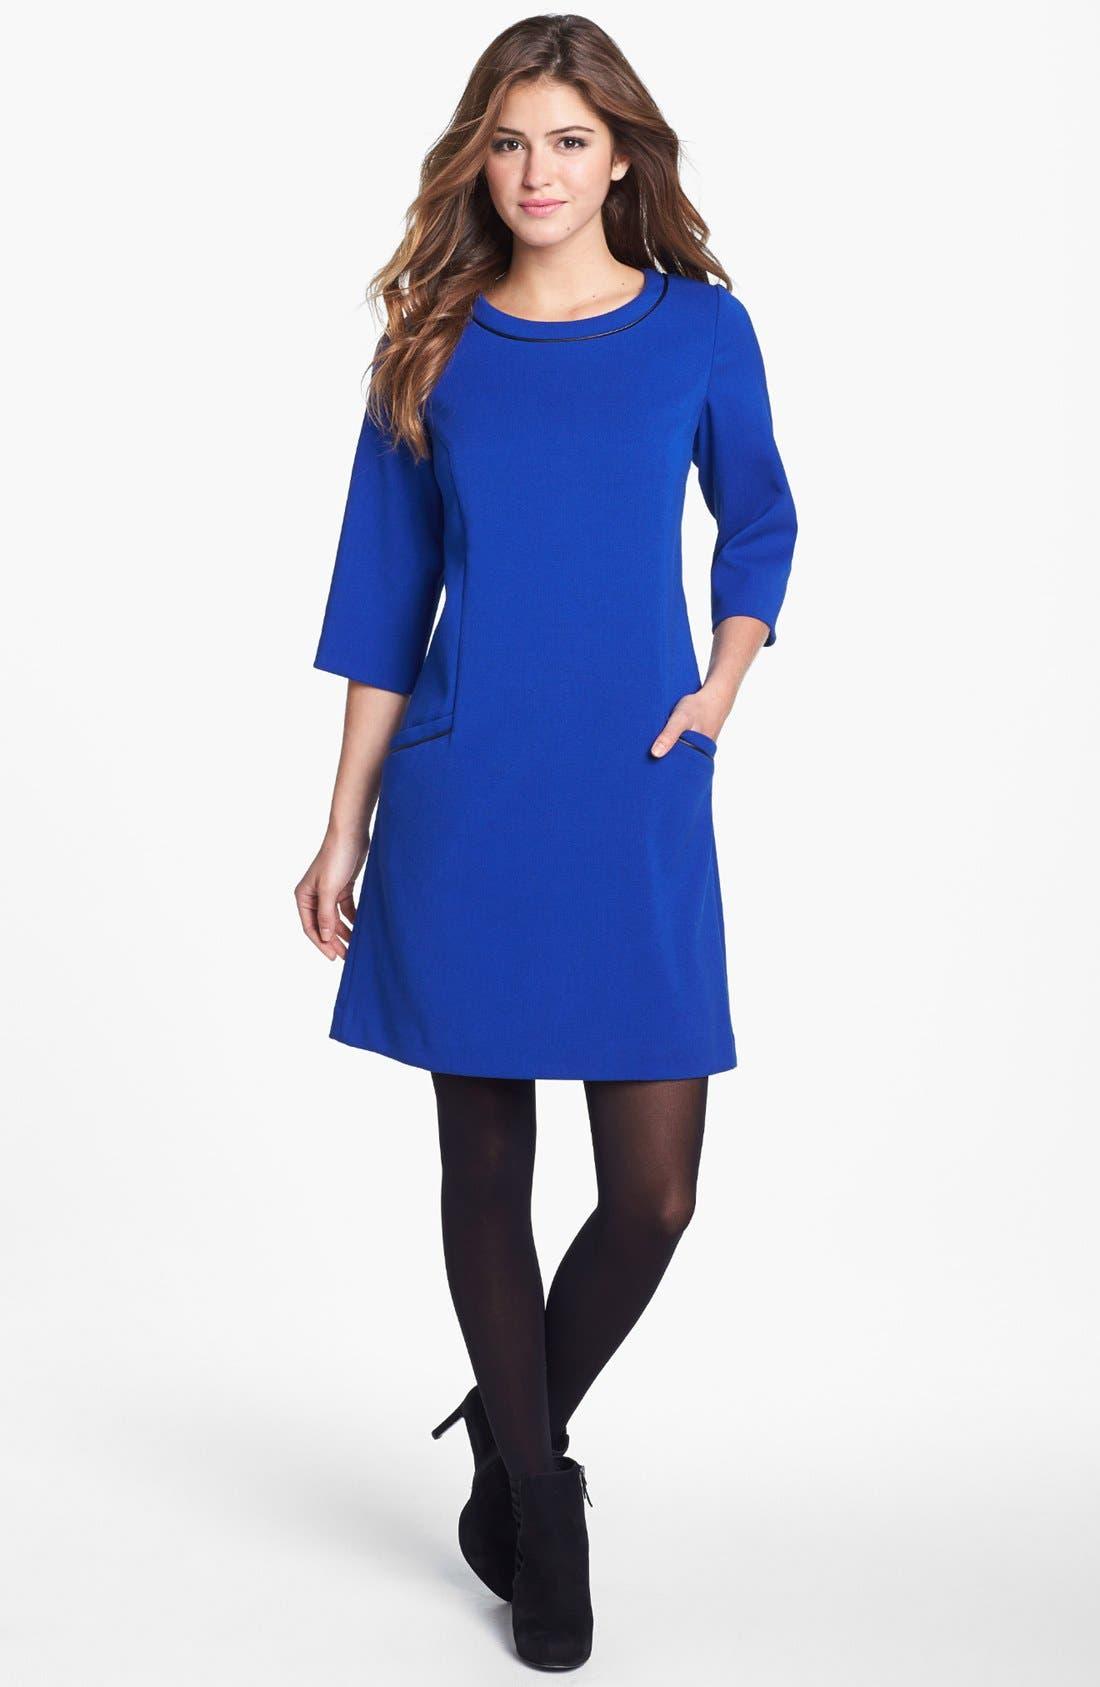 Main Image - Eliza J Faux Leather Trim Ponte Shift Dress (Online Only)